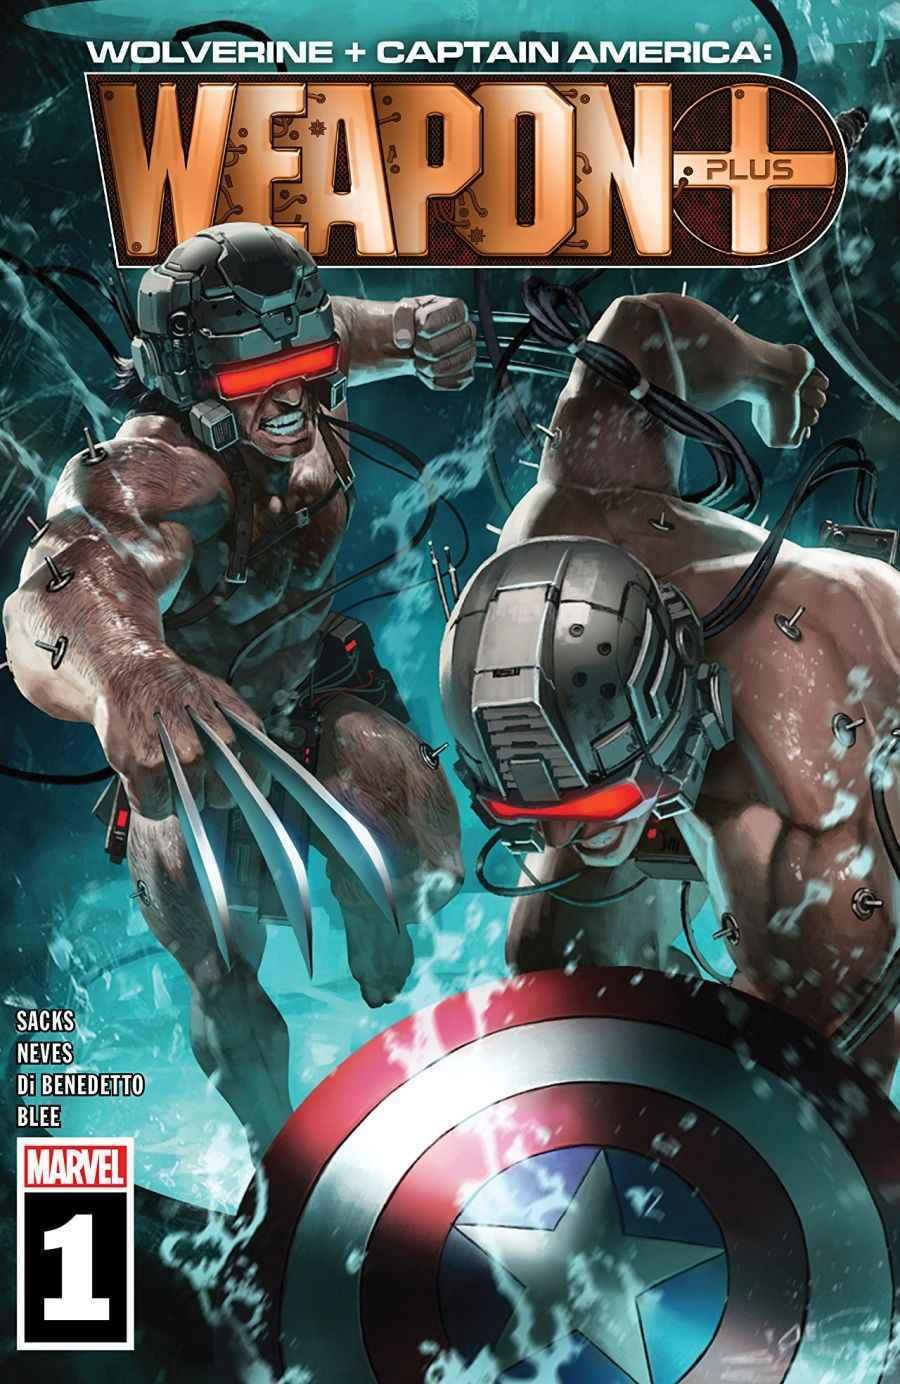 Wolverine & Captain America Weapon Plus #1